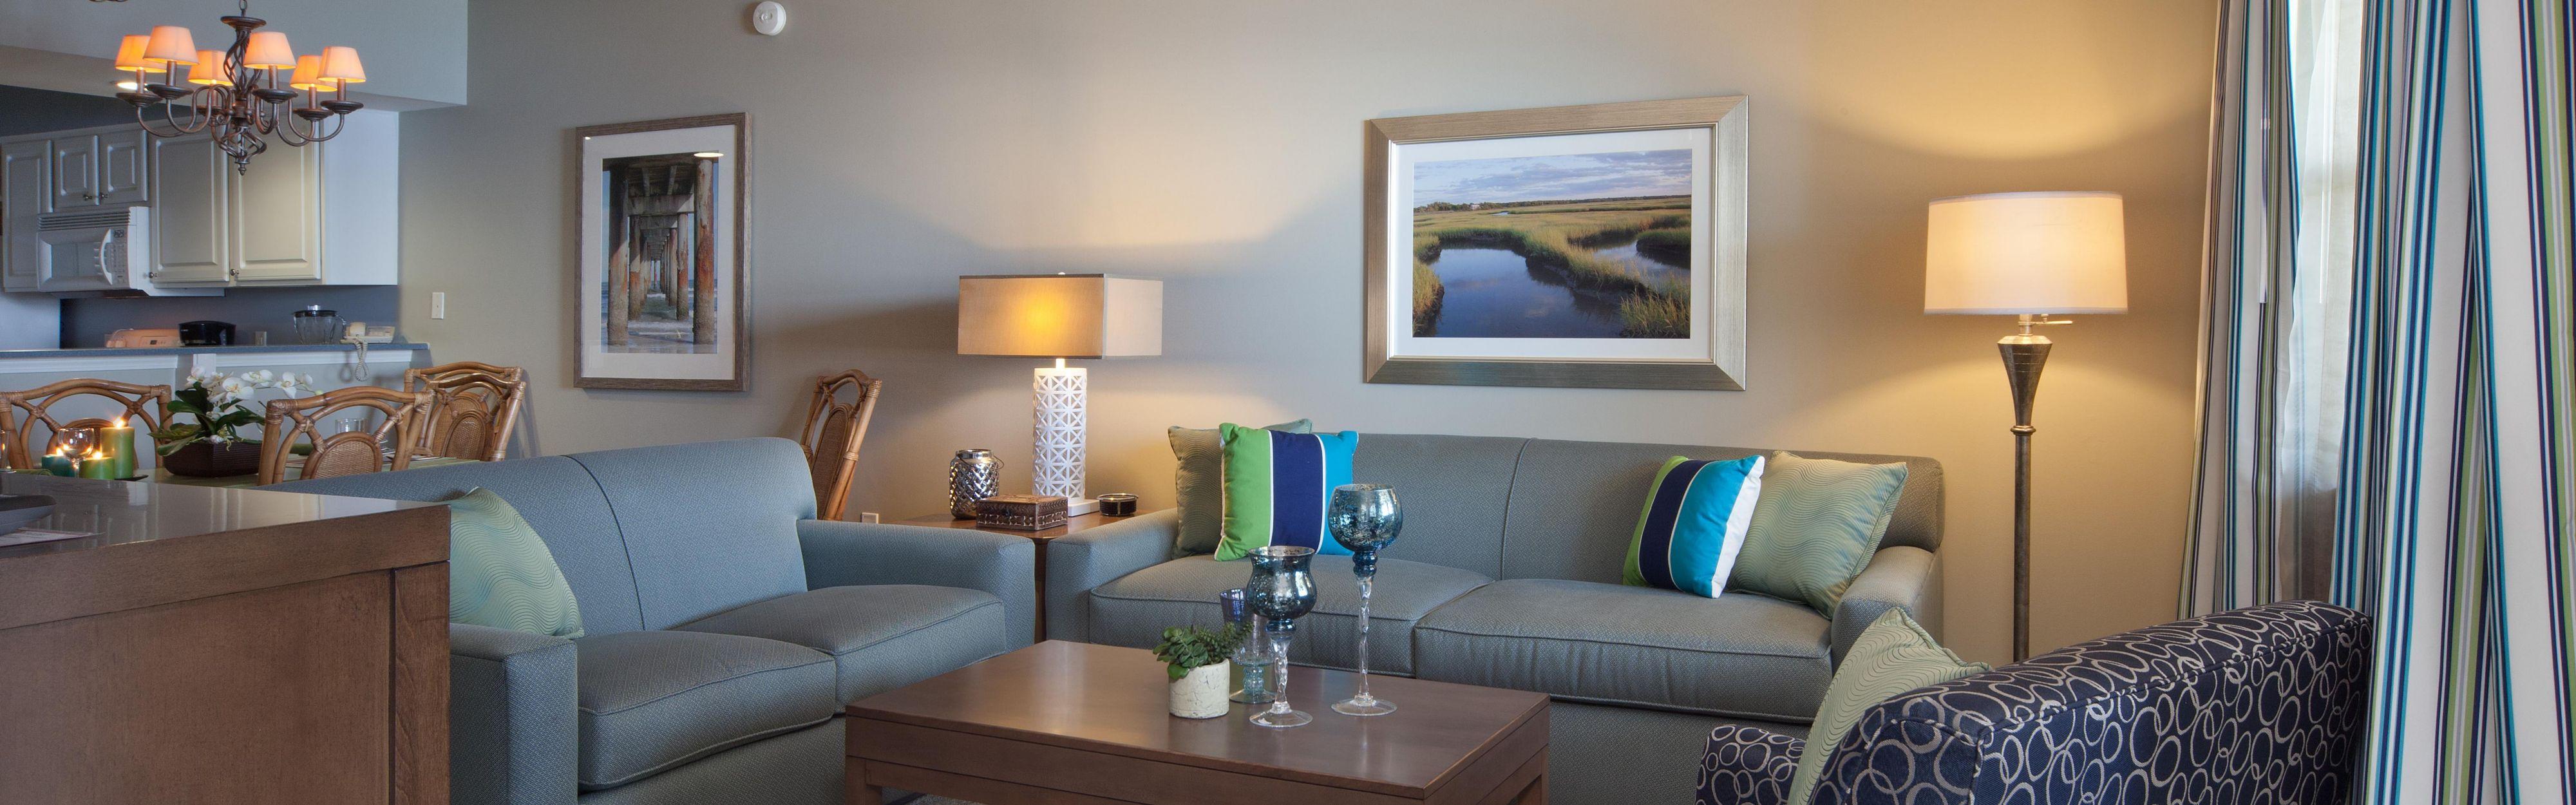 Holiday Inn Club Vacations Panama City Beach Resort image 1